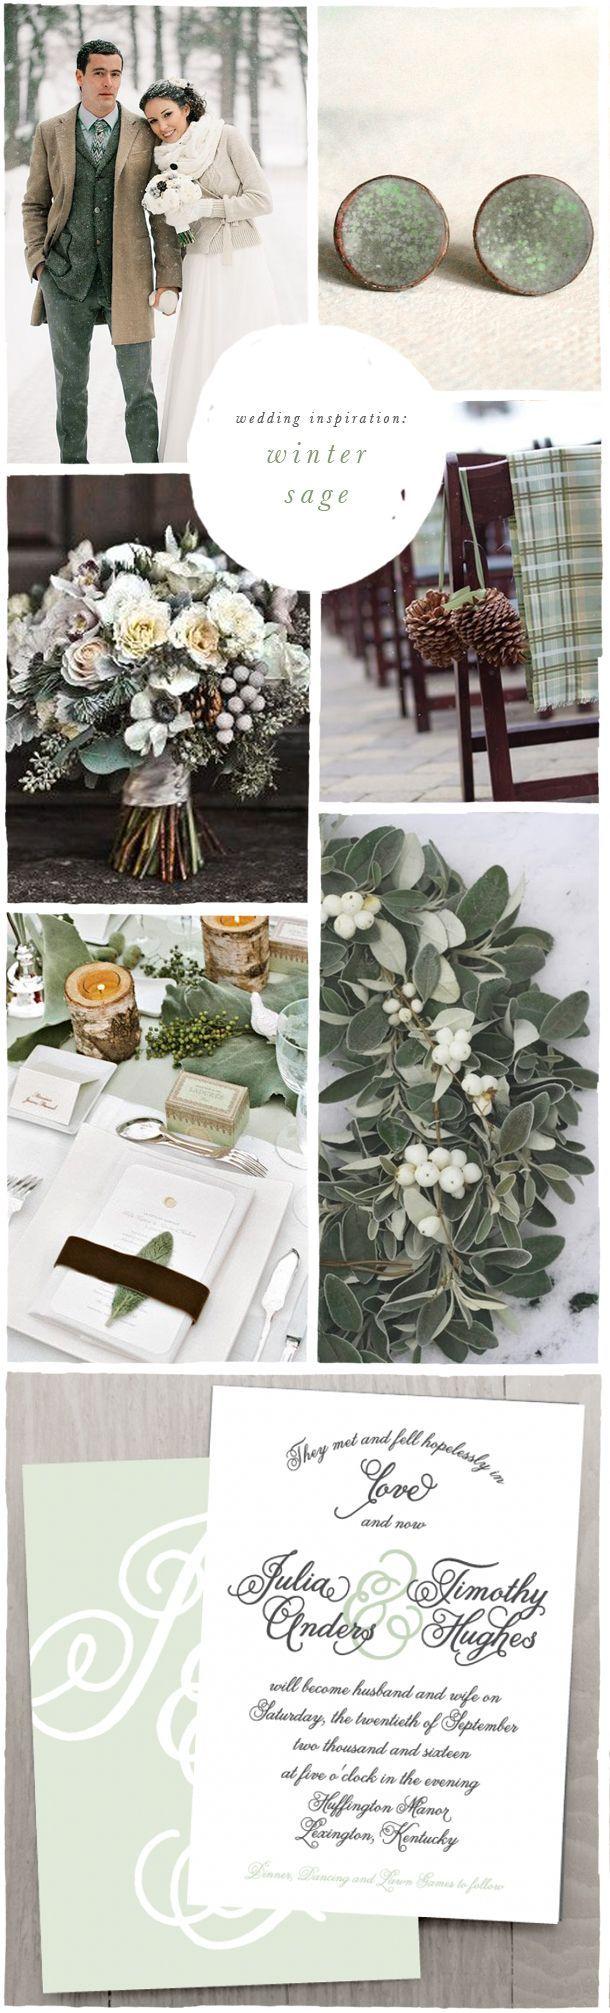 winter wedding                                                                                                                                                                                 More